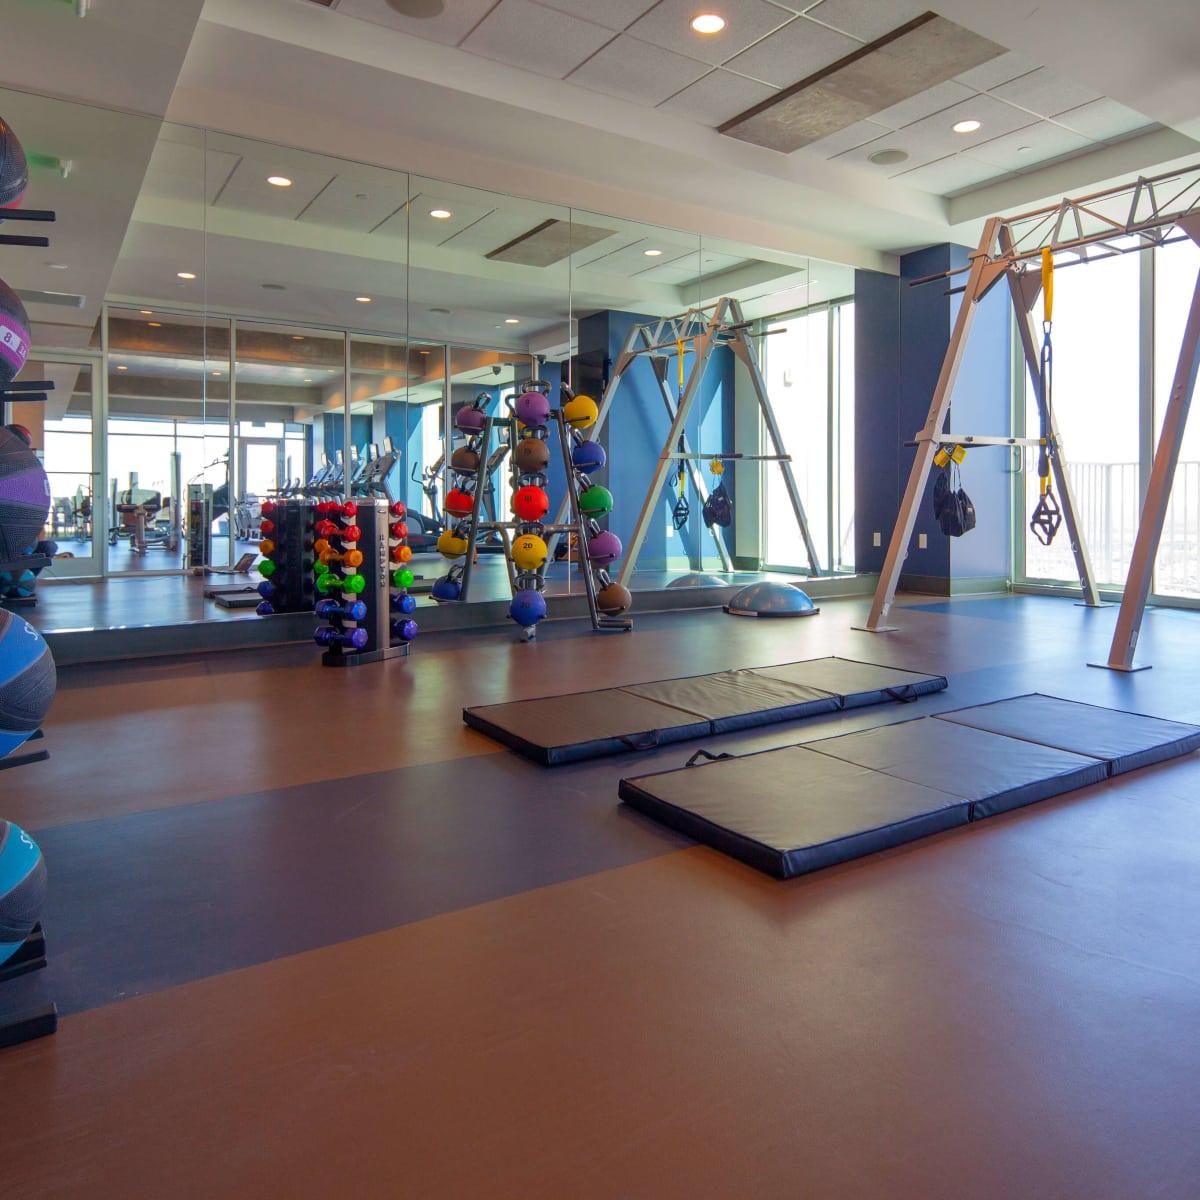 Skyhouse Dallas fitness room